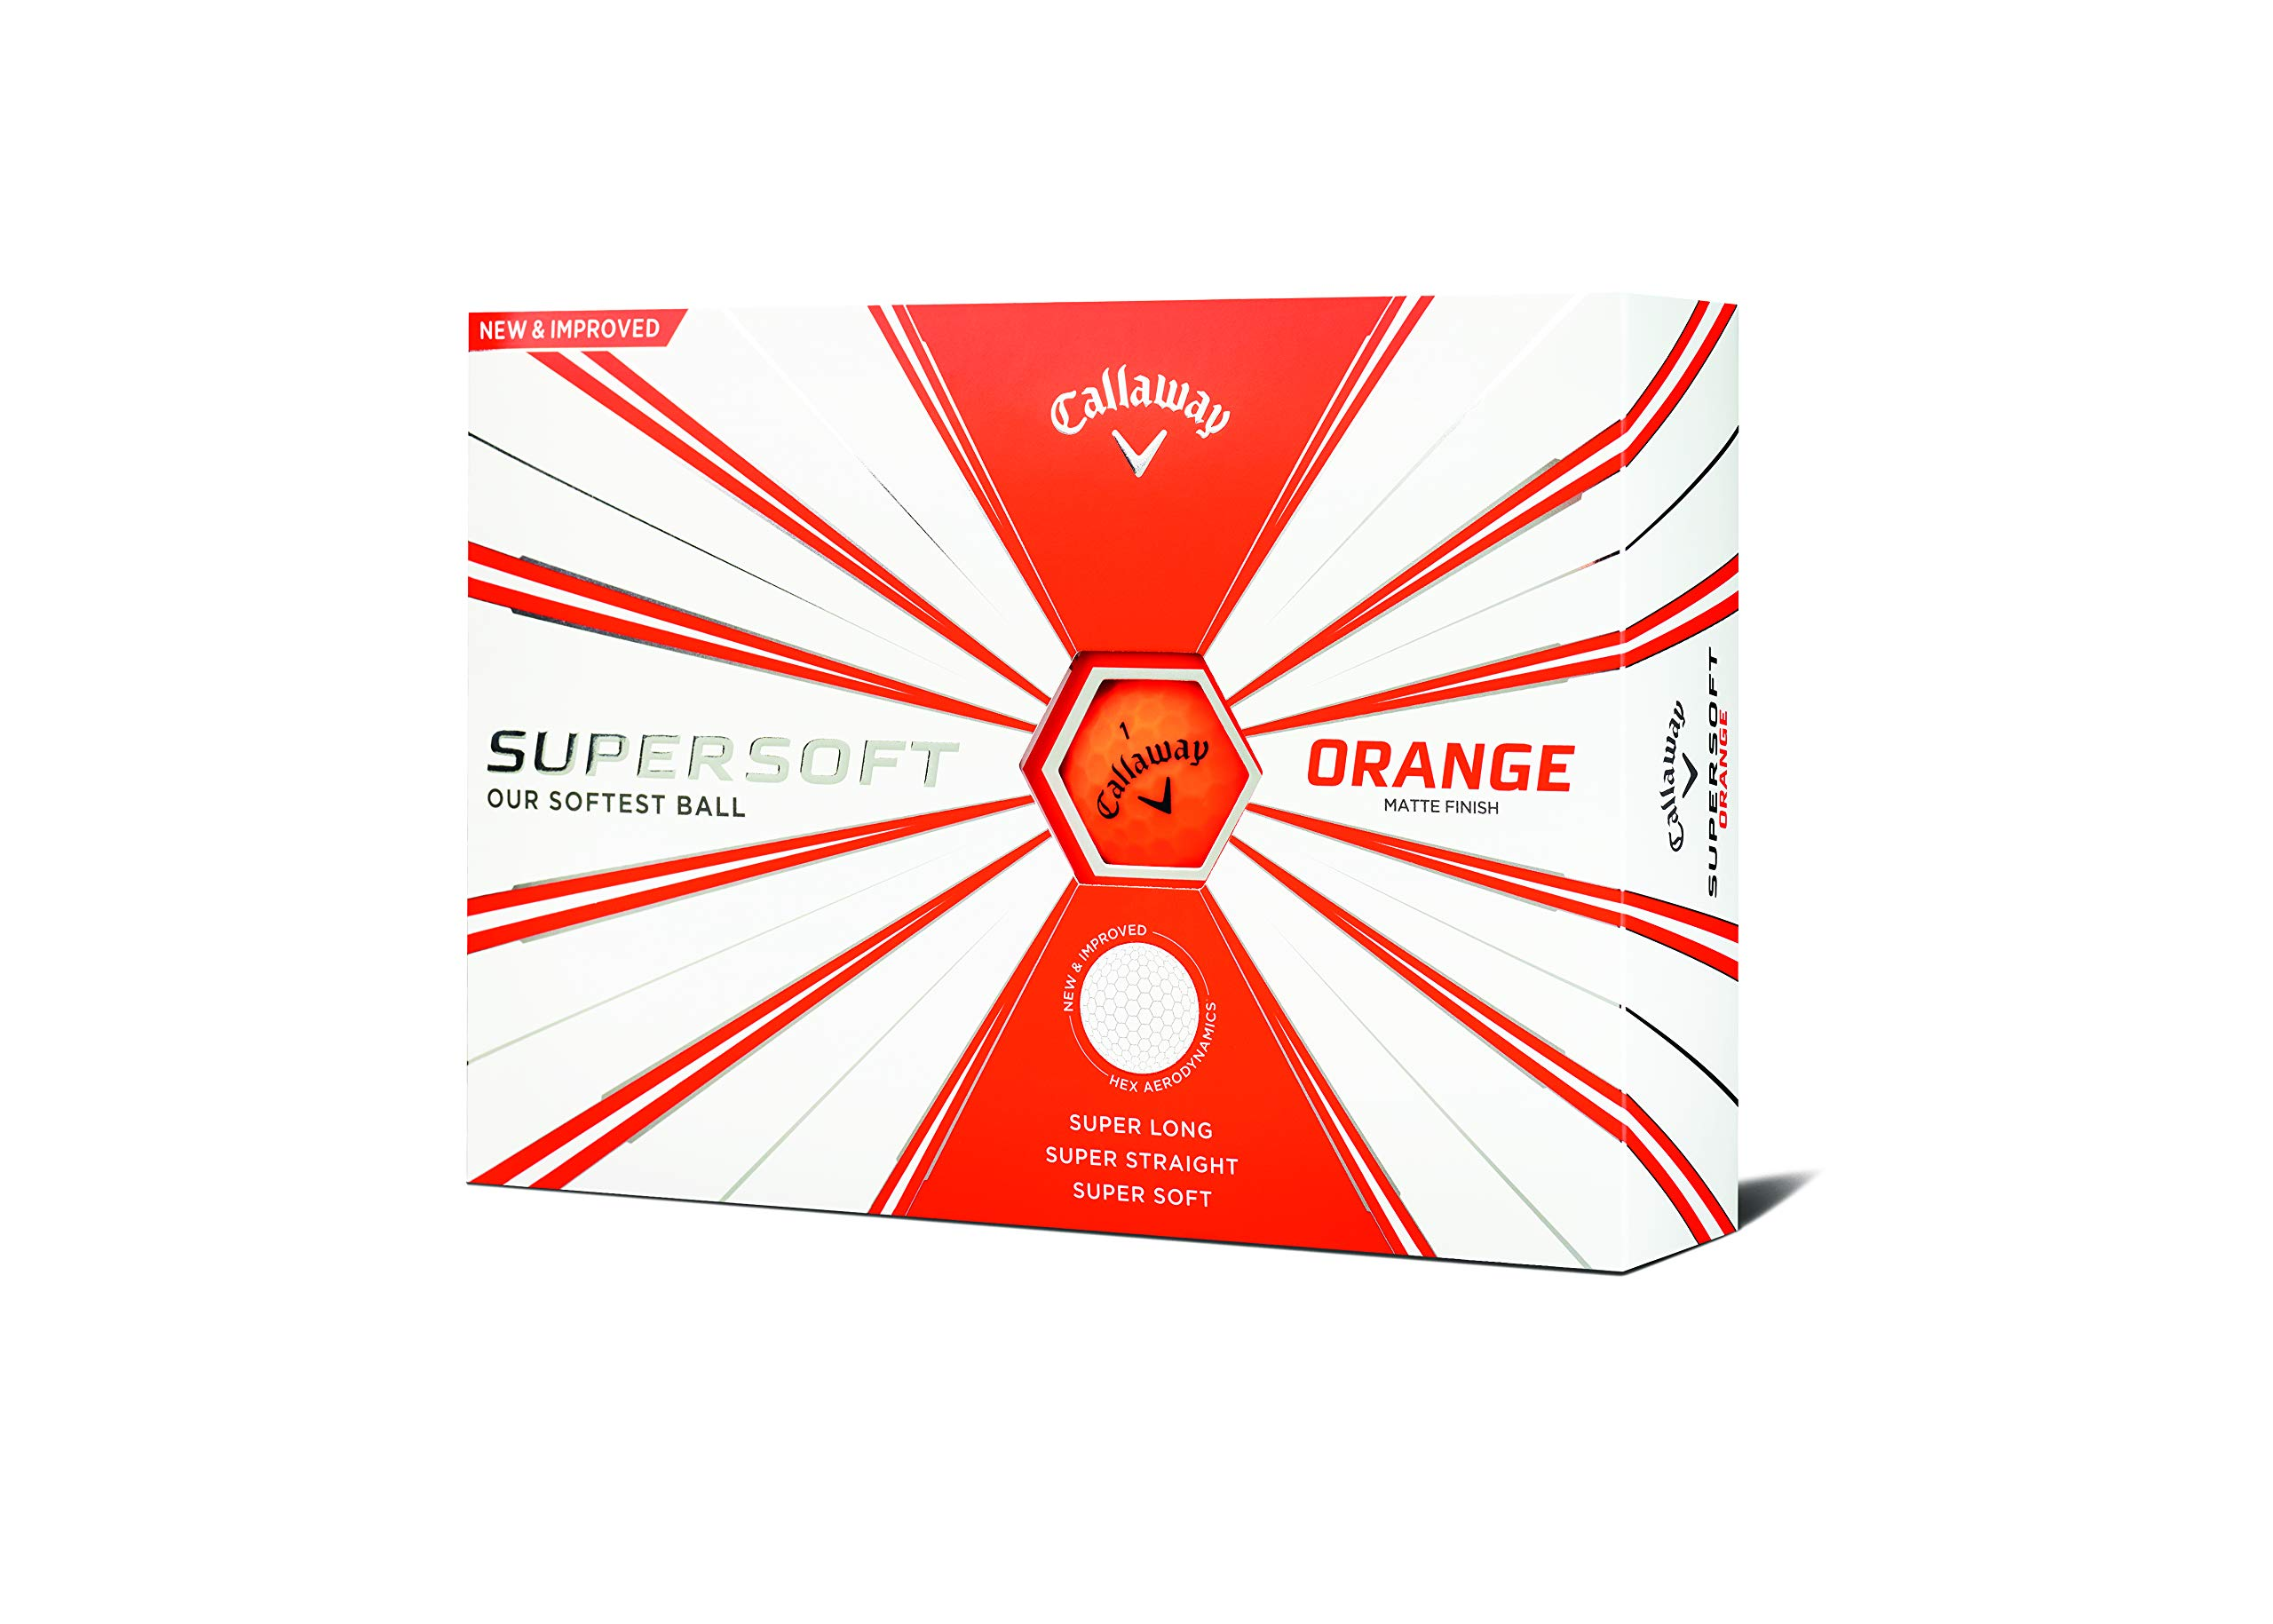 Callaway Golf Supersoft Golf Balls, (One Dozen), Orange, Matte Finish by Callaway